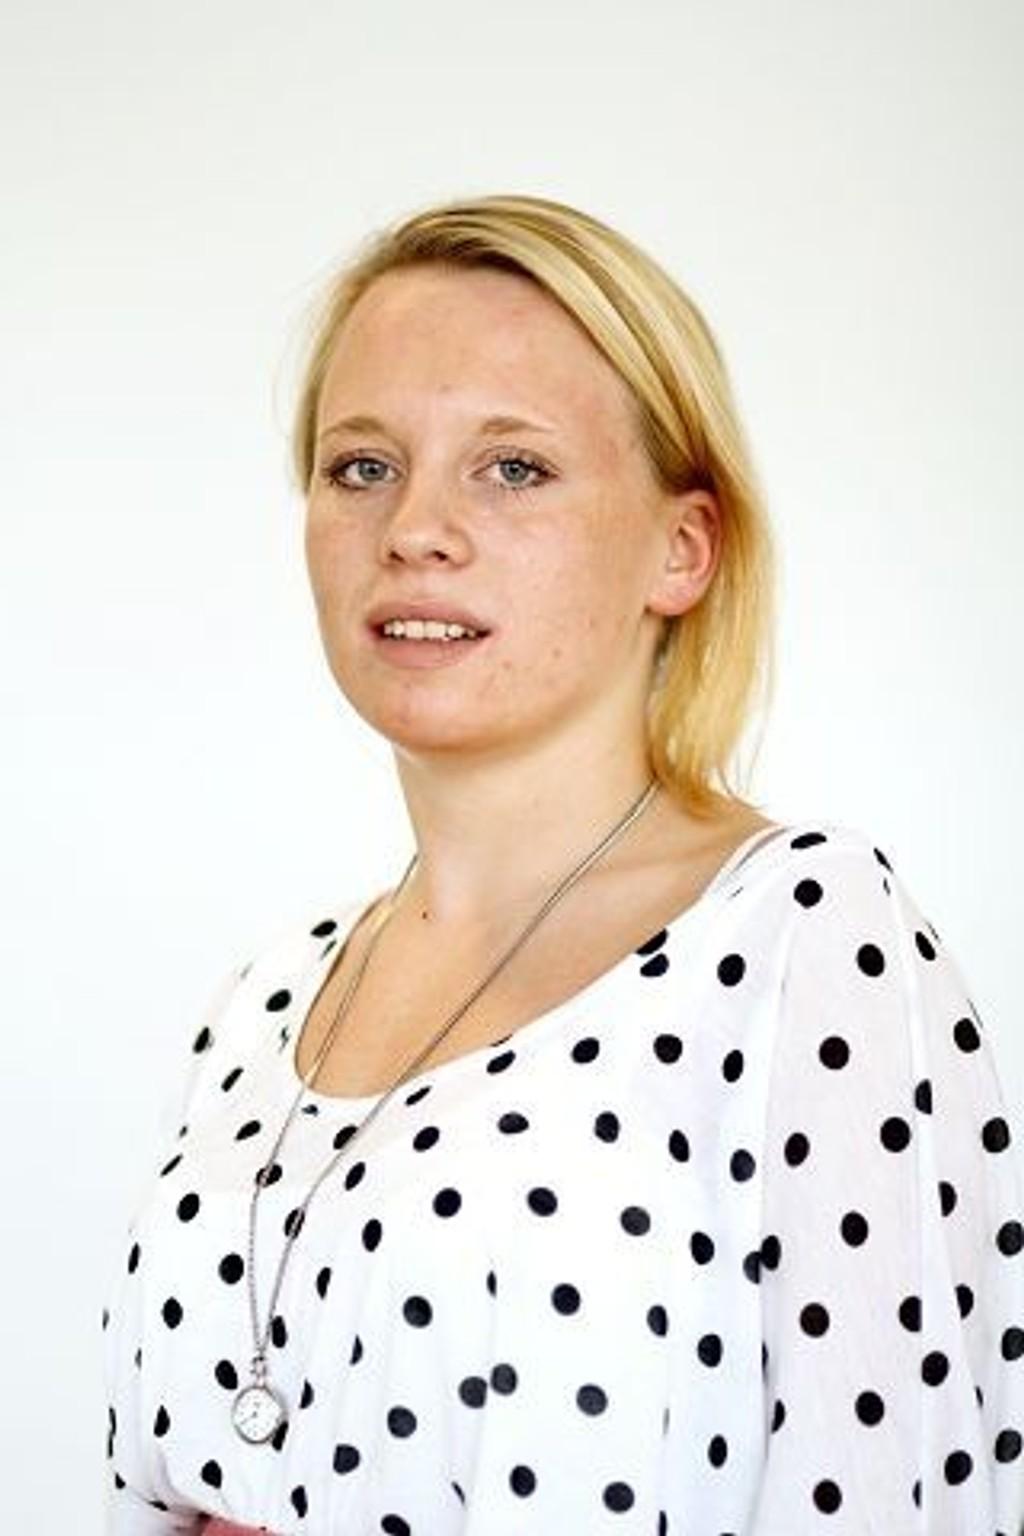 Kaisa Celius fra Trasop er valgt inn i sentralstyret til Rød Ungdom.